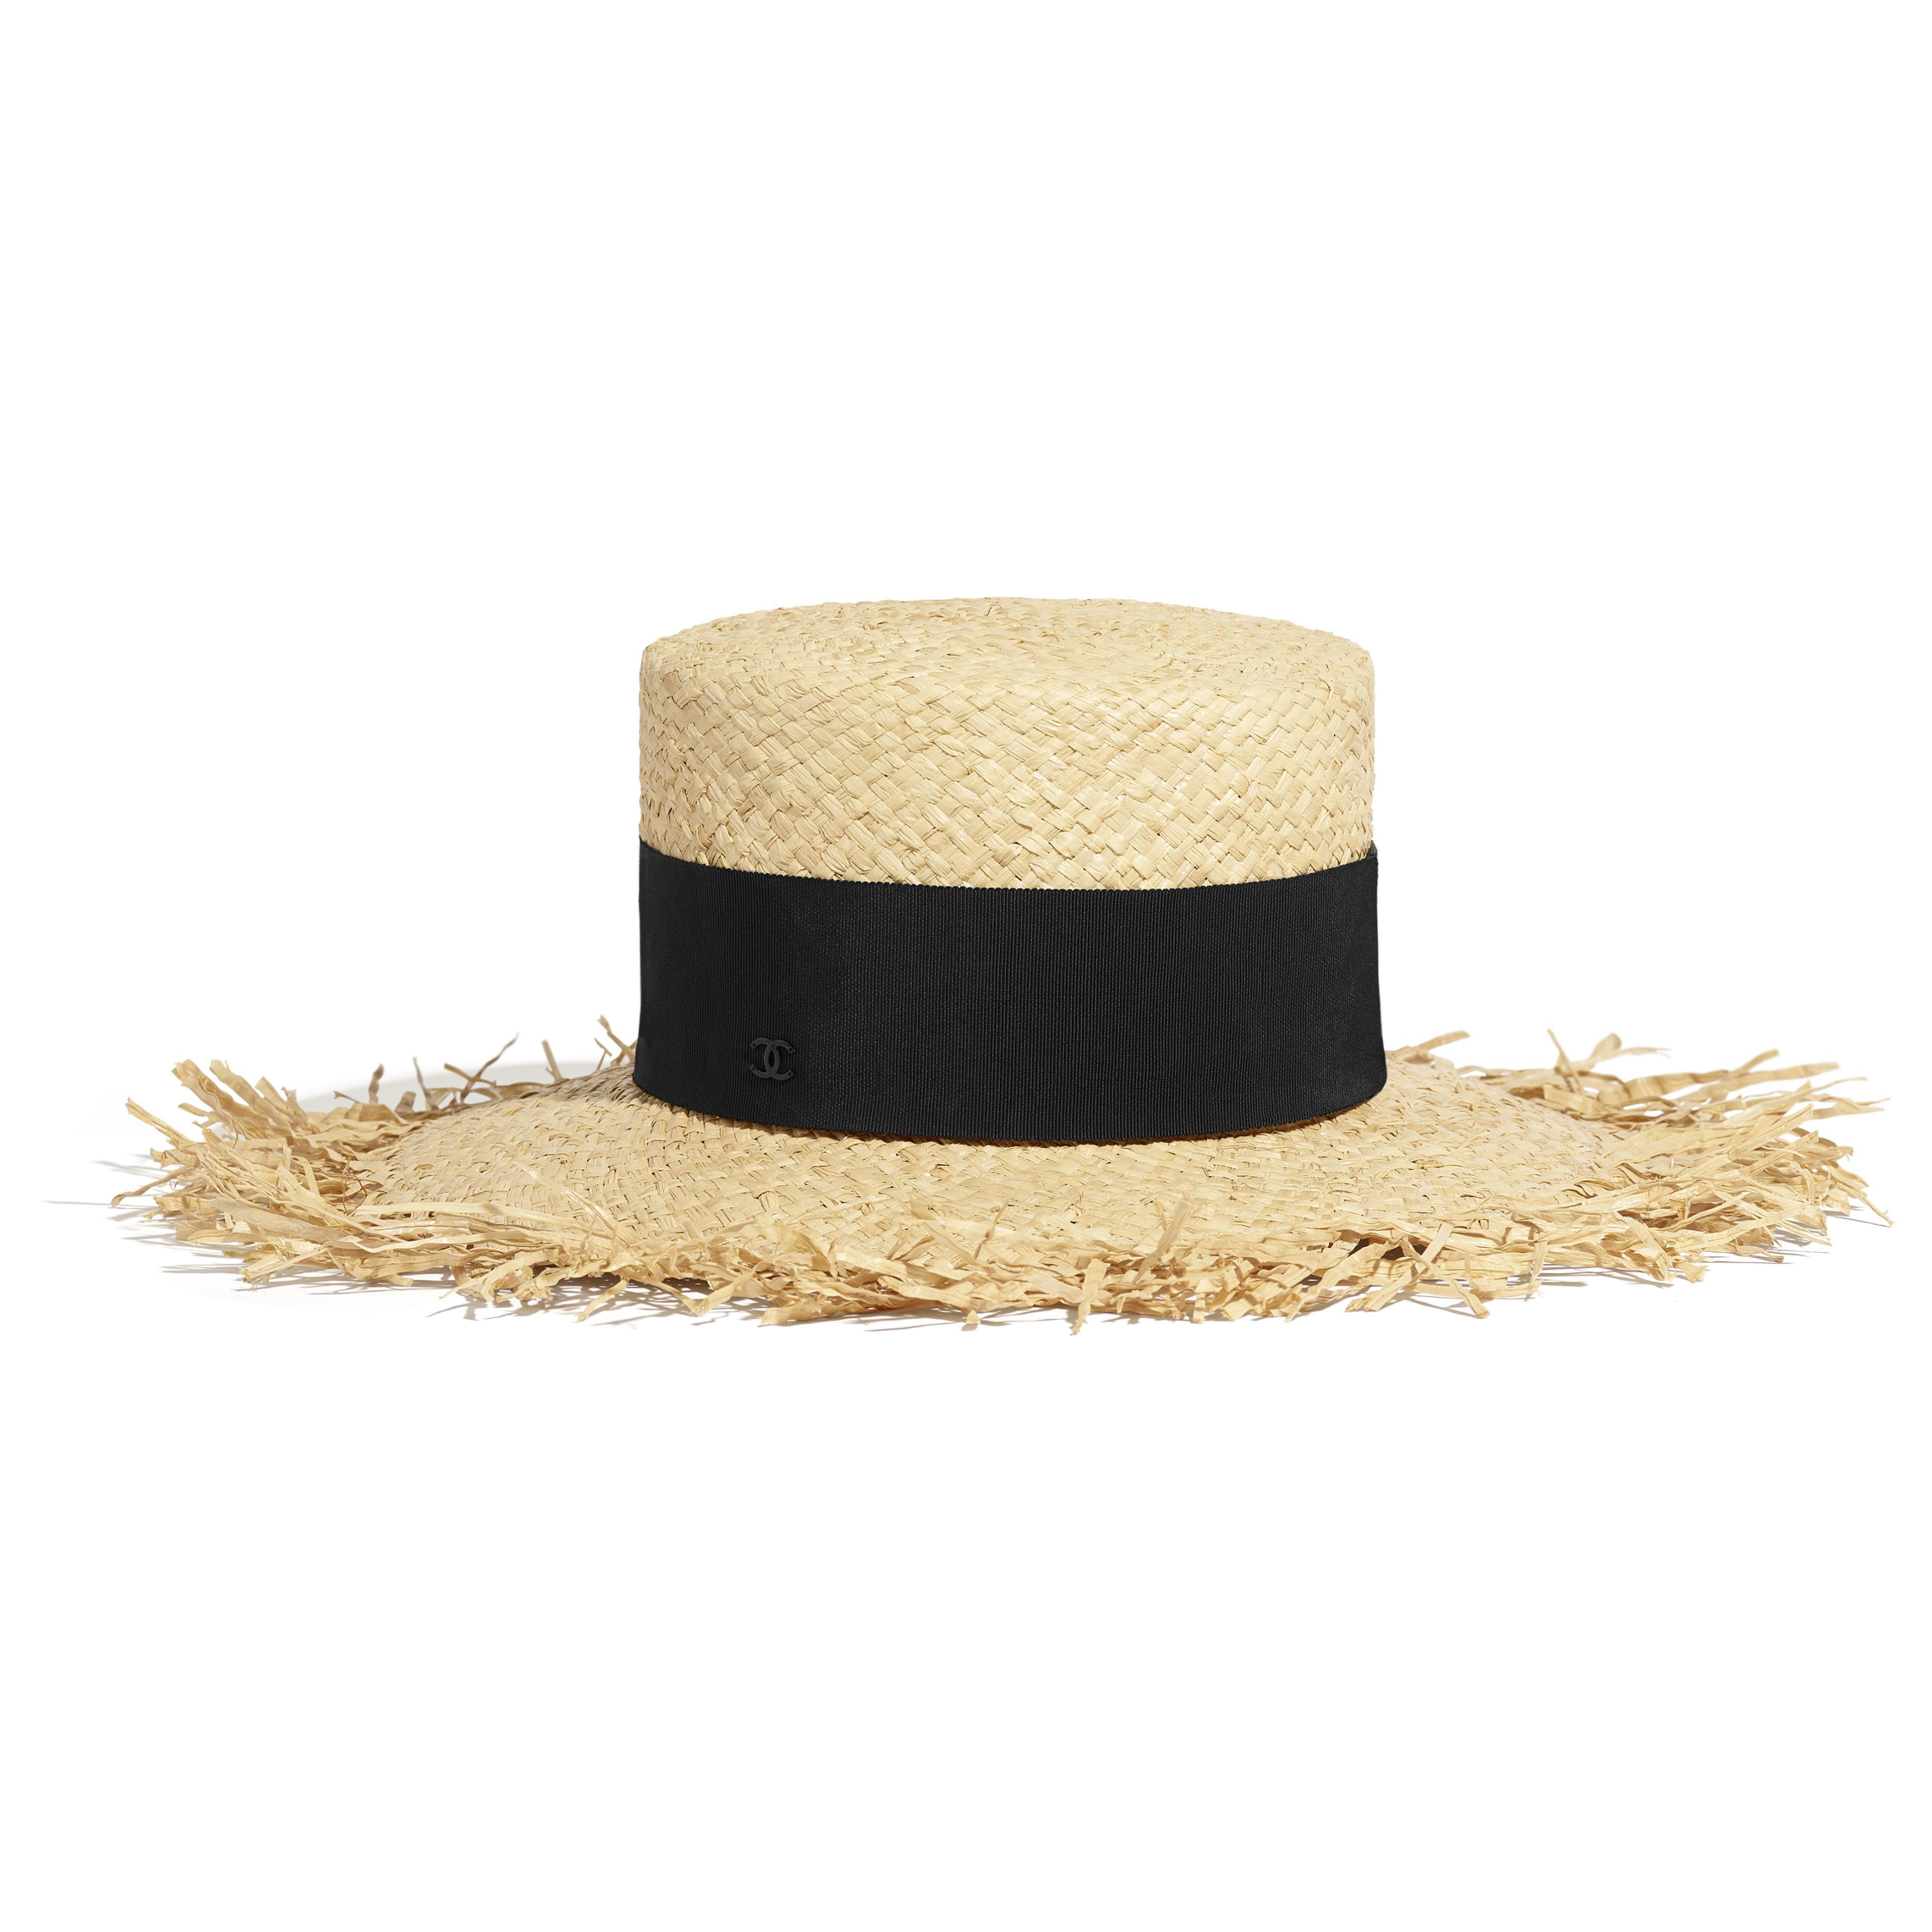 Wide-Brimmed Hat - Beige & Black - Raffia, Grosgrain & Metal - Default view - see full sized version